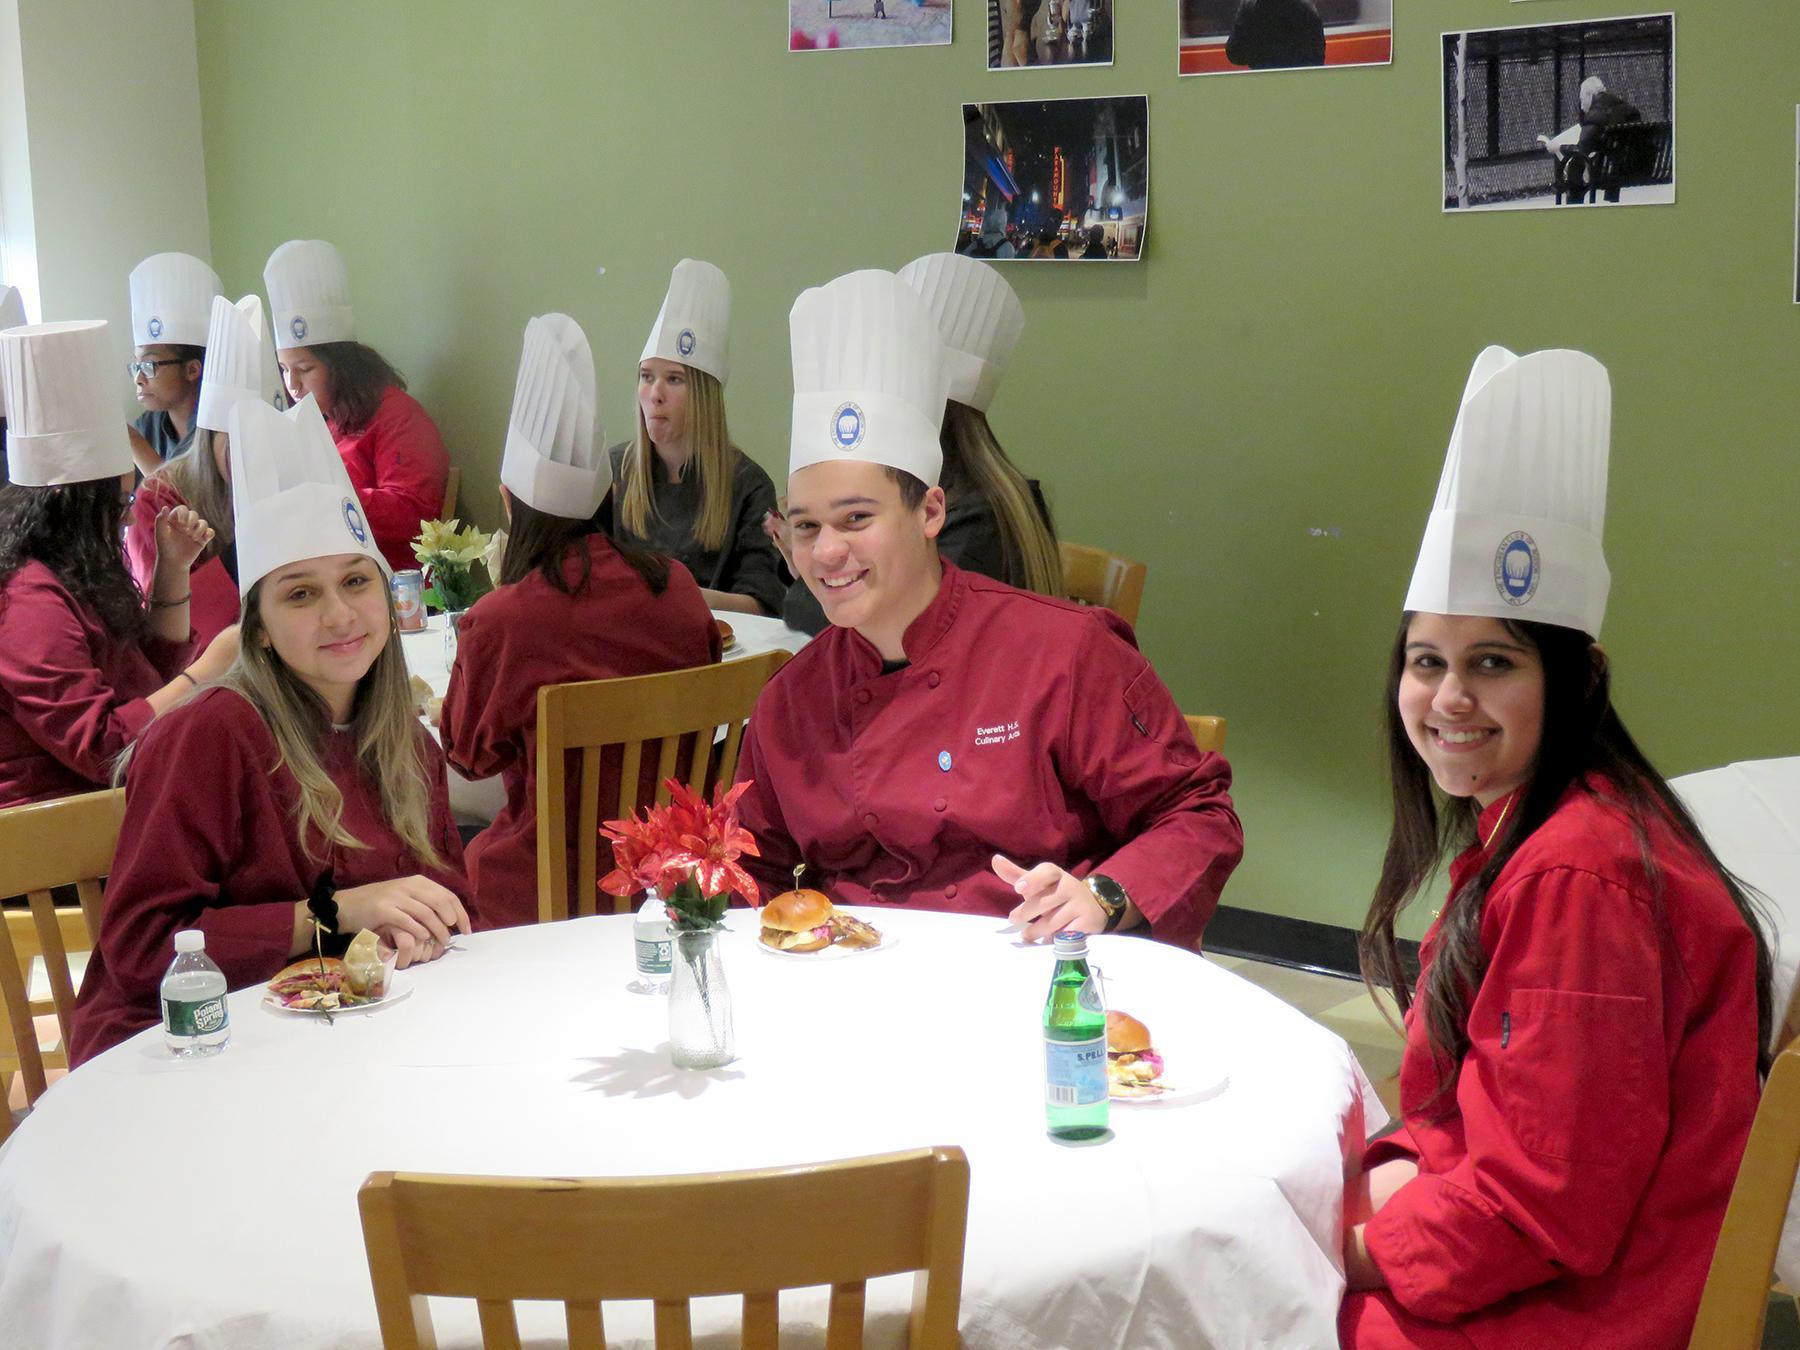 Three EHS students at a table